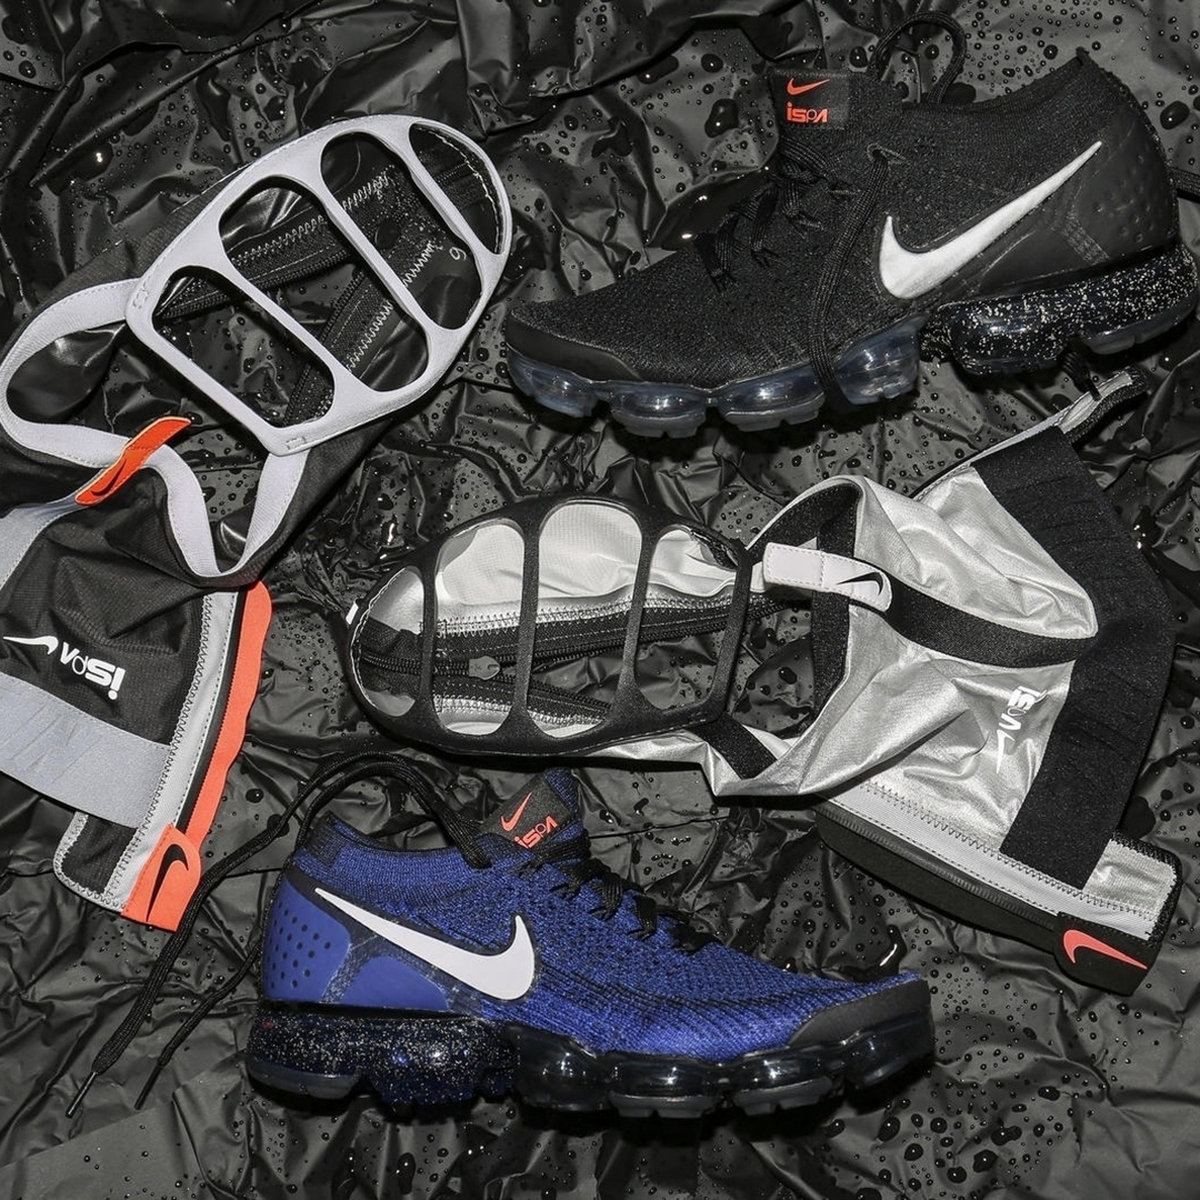 Nike Air Vapormax Flyknit Gaiter ISPA